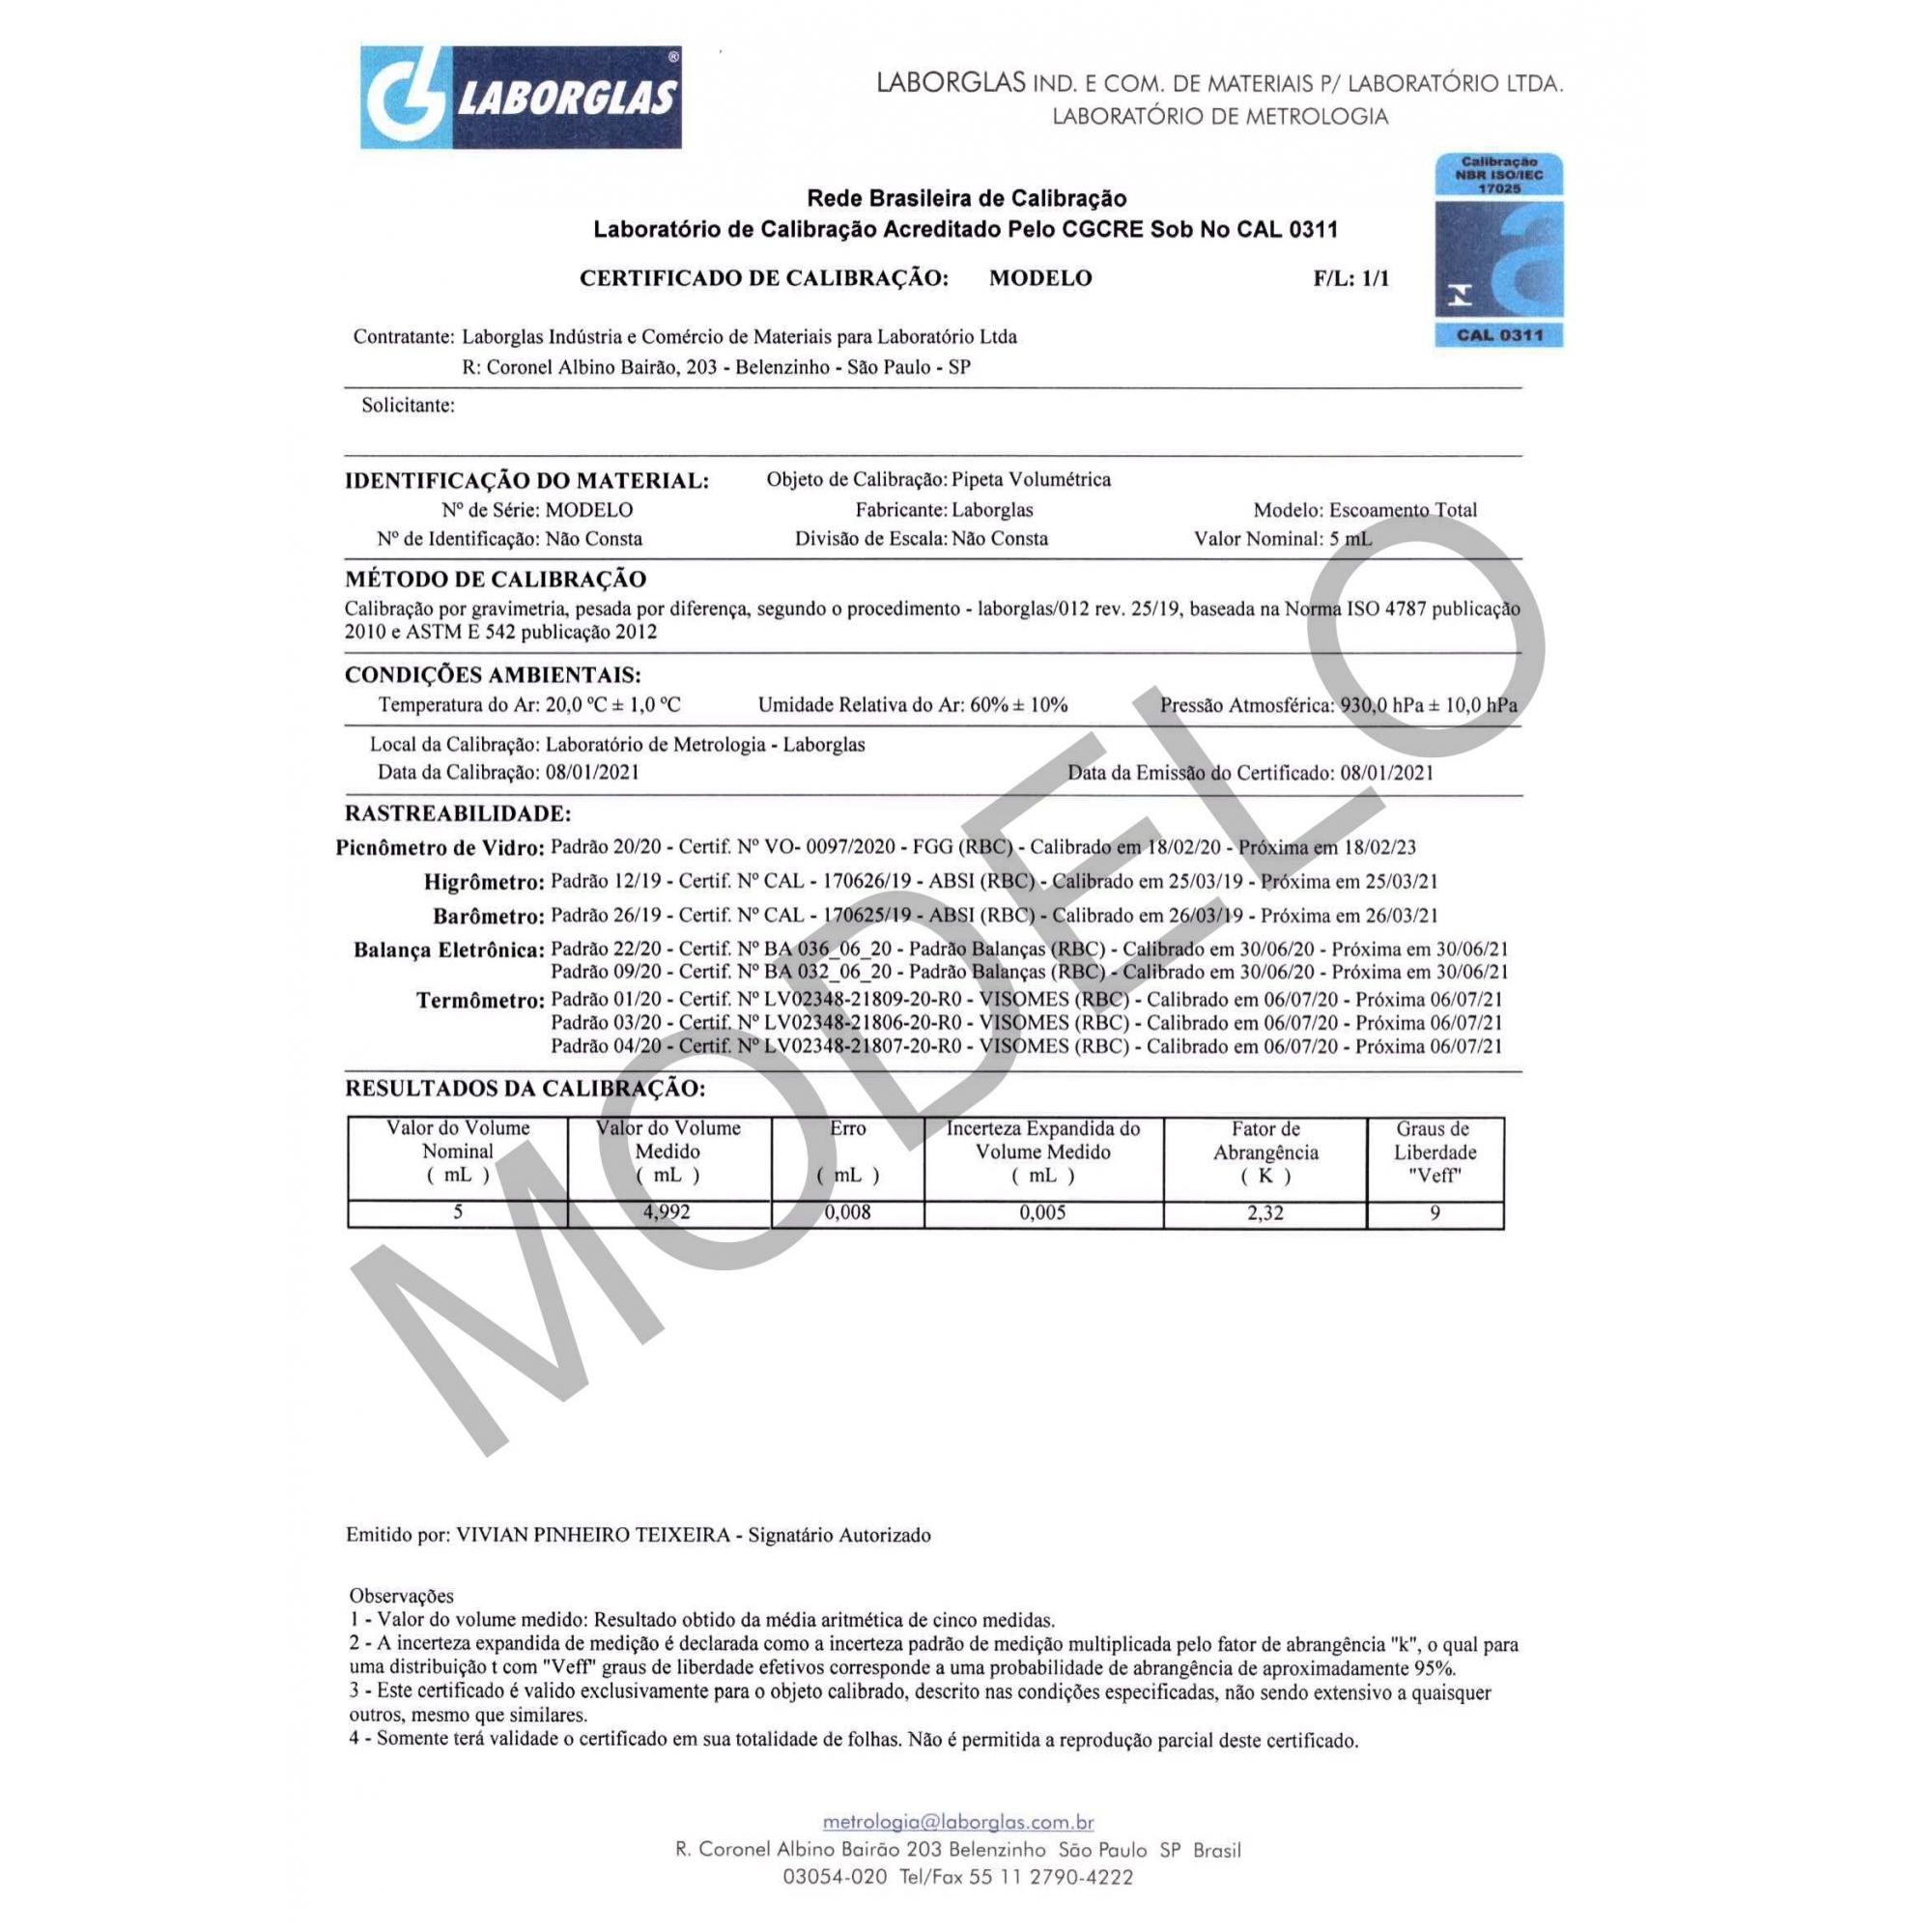 PIPETA VOLUMÉTRICA ESGOTAMENTO TOTAL 7 ML CERTIFICADO RBC - Laborglas - Cód. 9433708-R